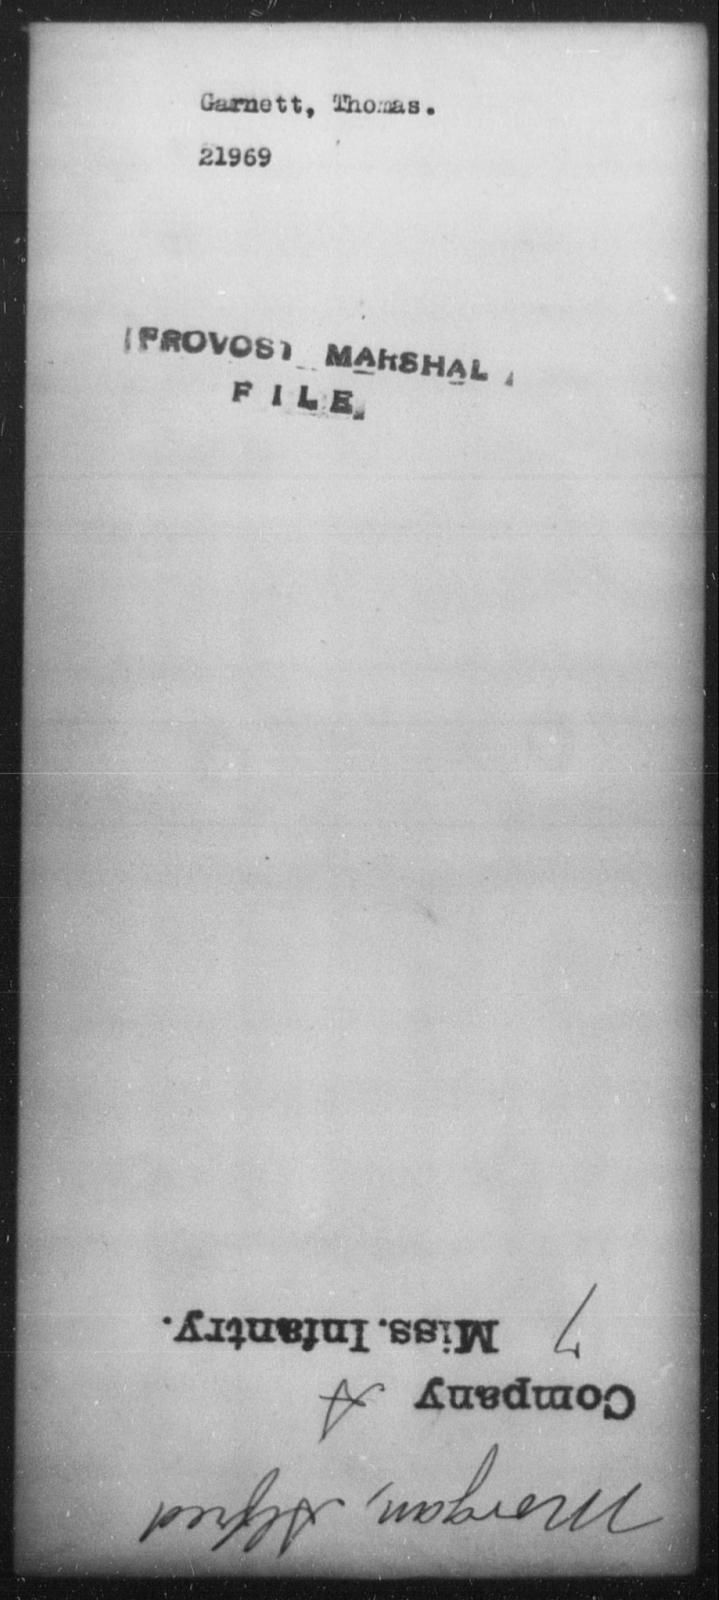 Garnett, Thomas - State: [Blank] - Year: [Blank]